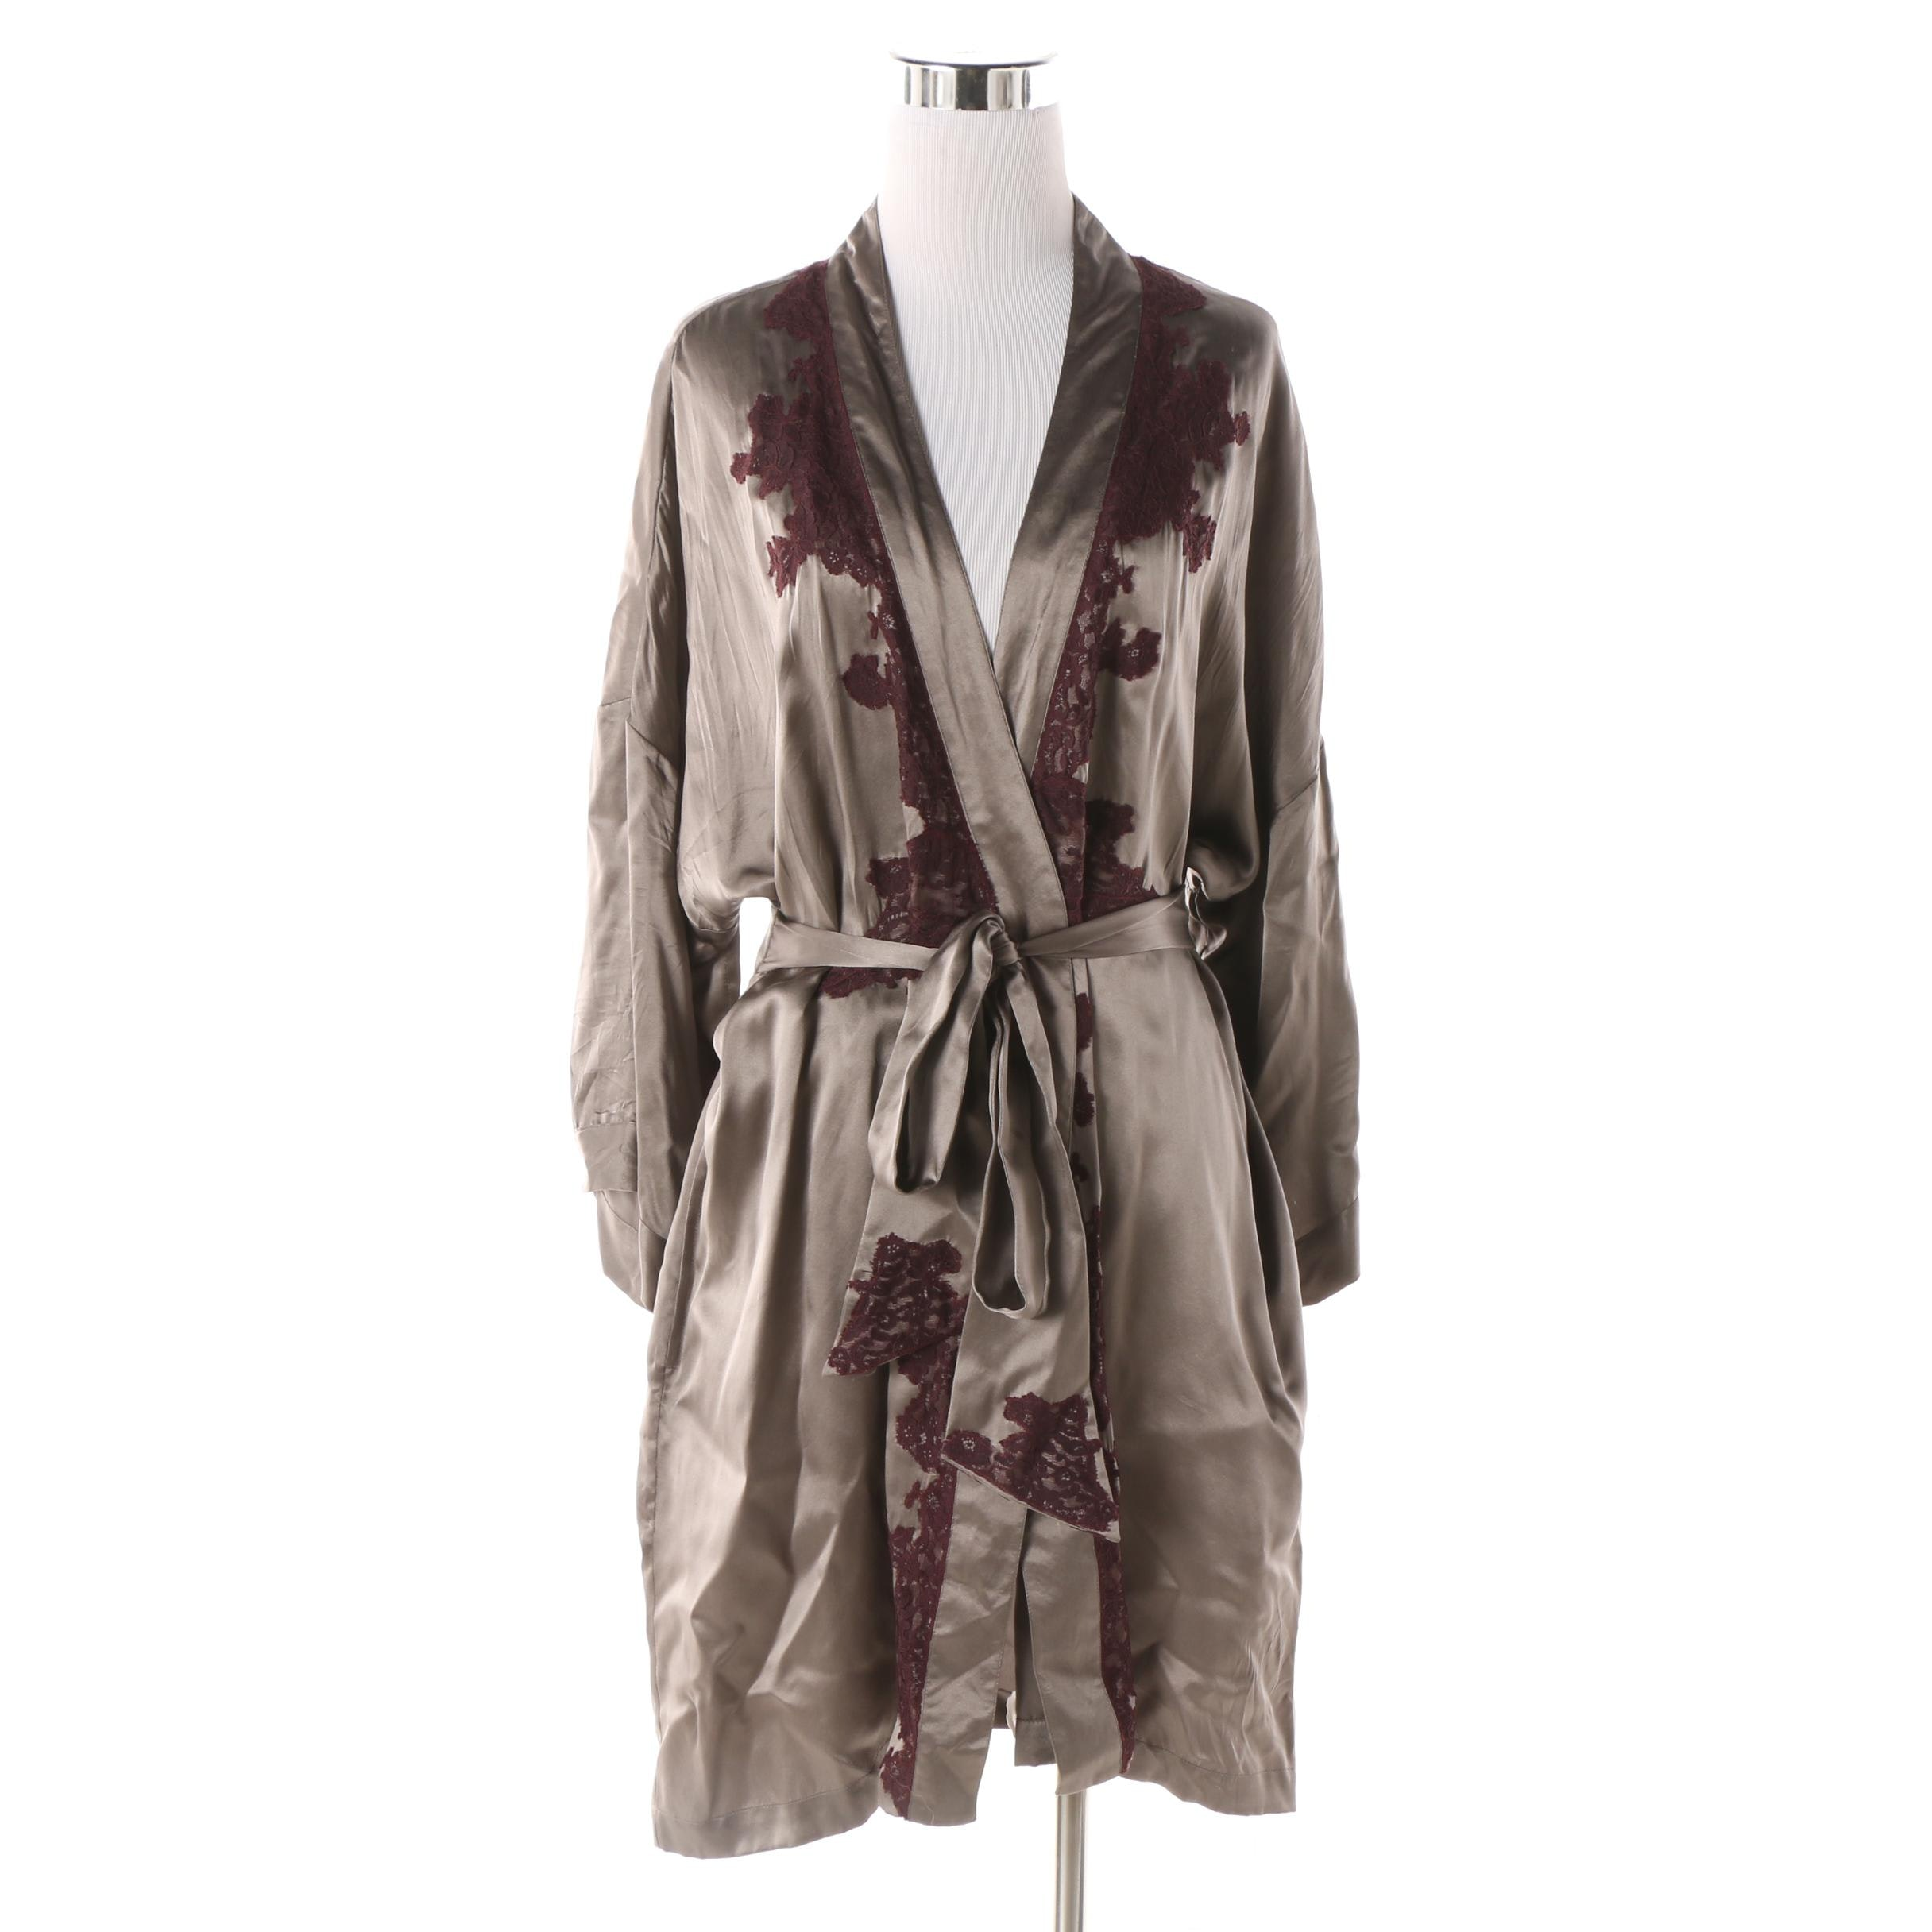 Leigh Bantivoglio Grey Silk Robe with Lace Trim and Tie Belt